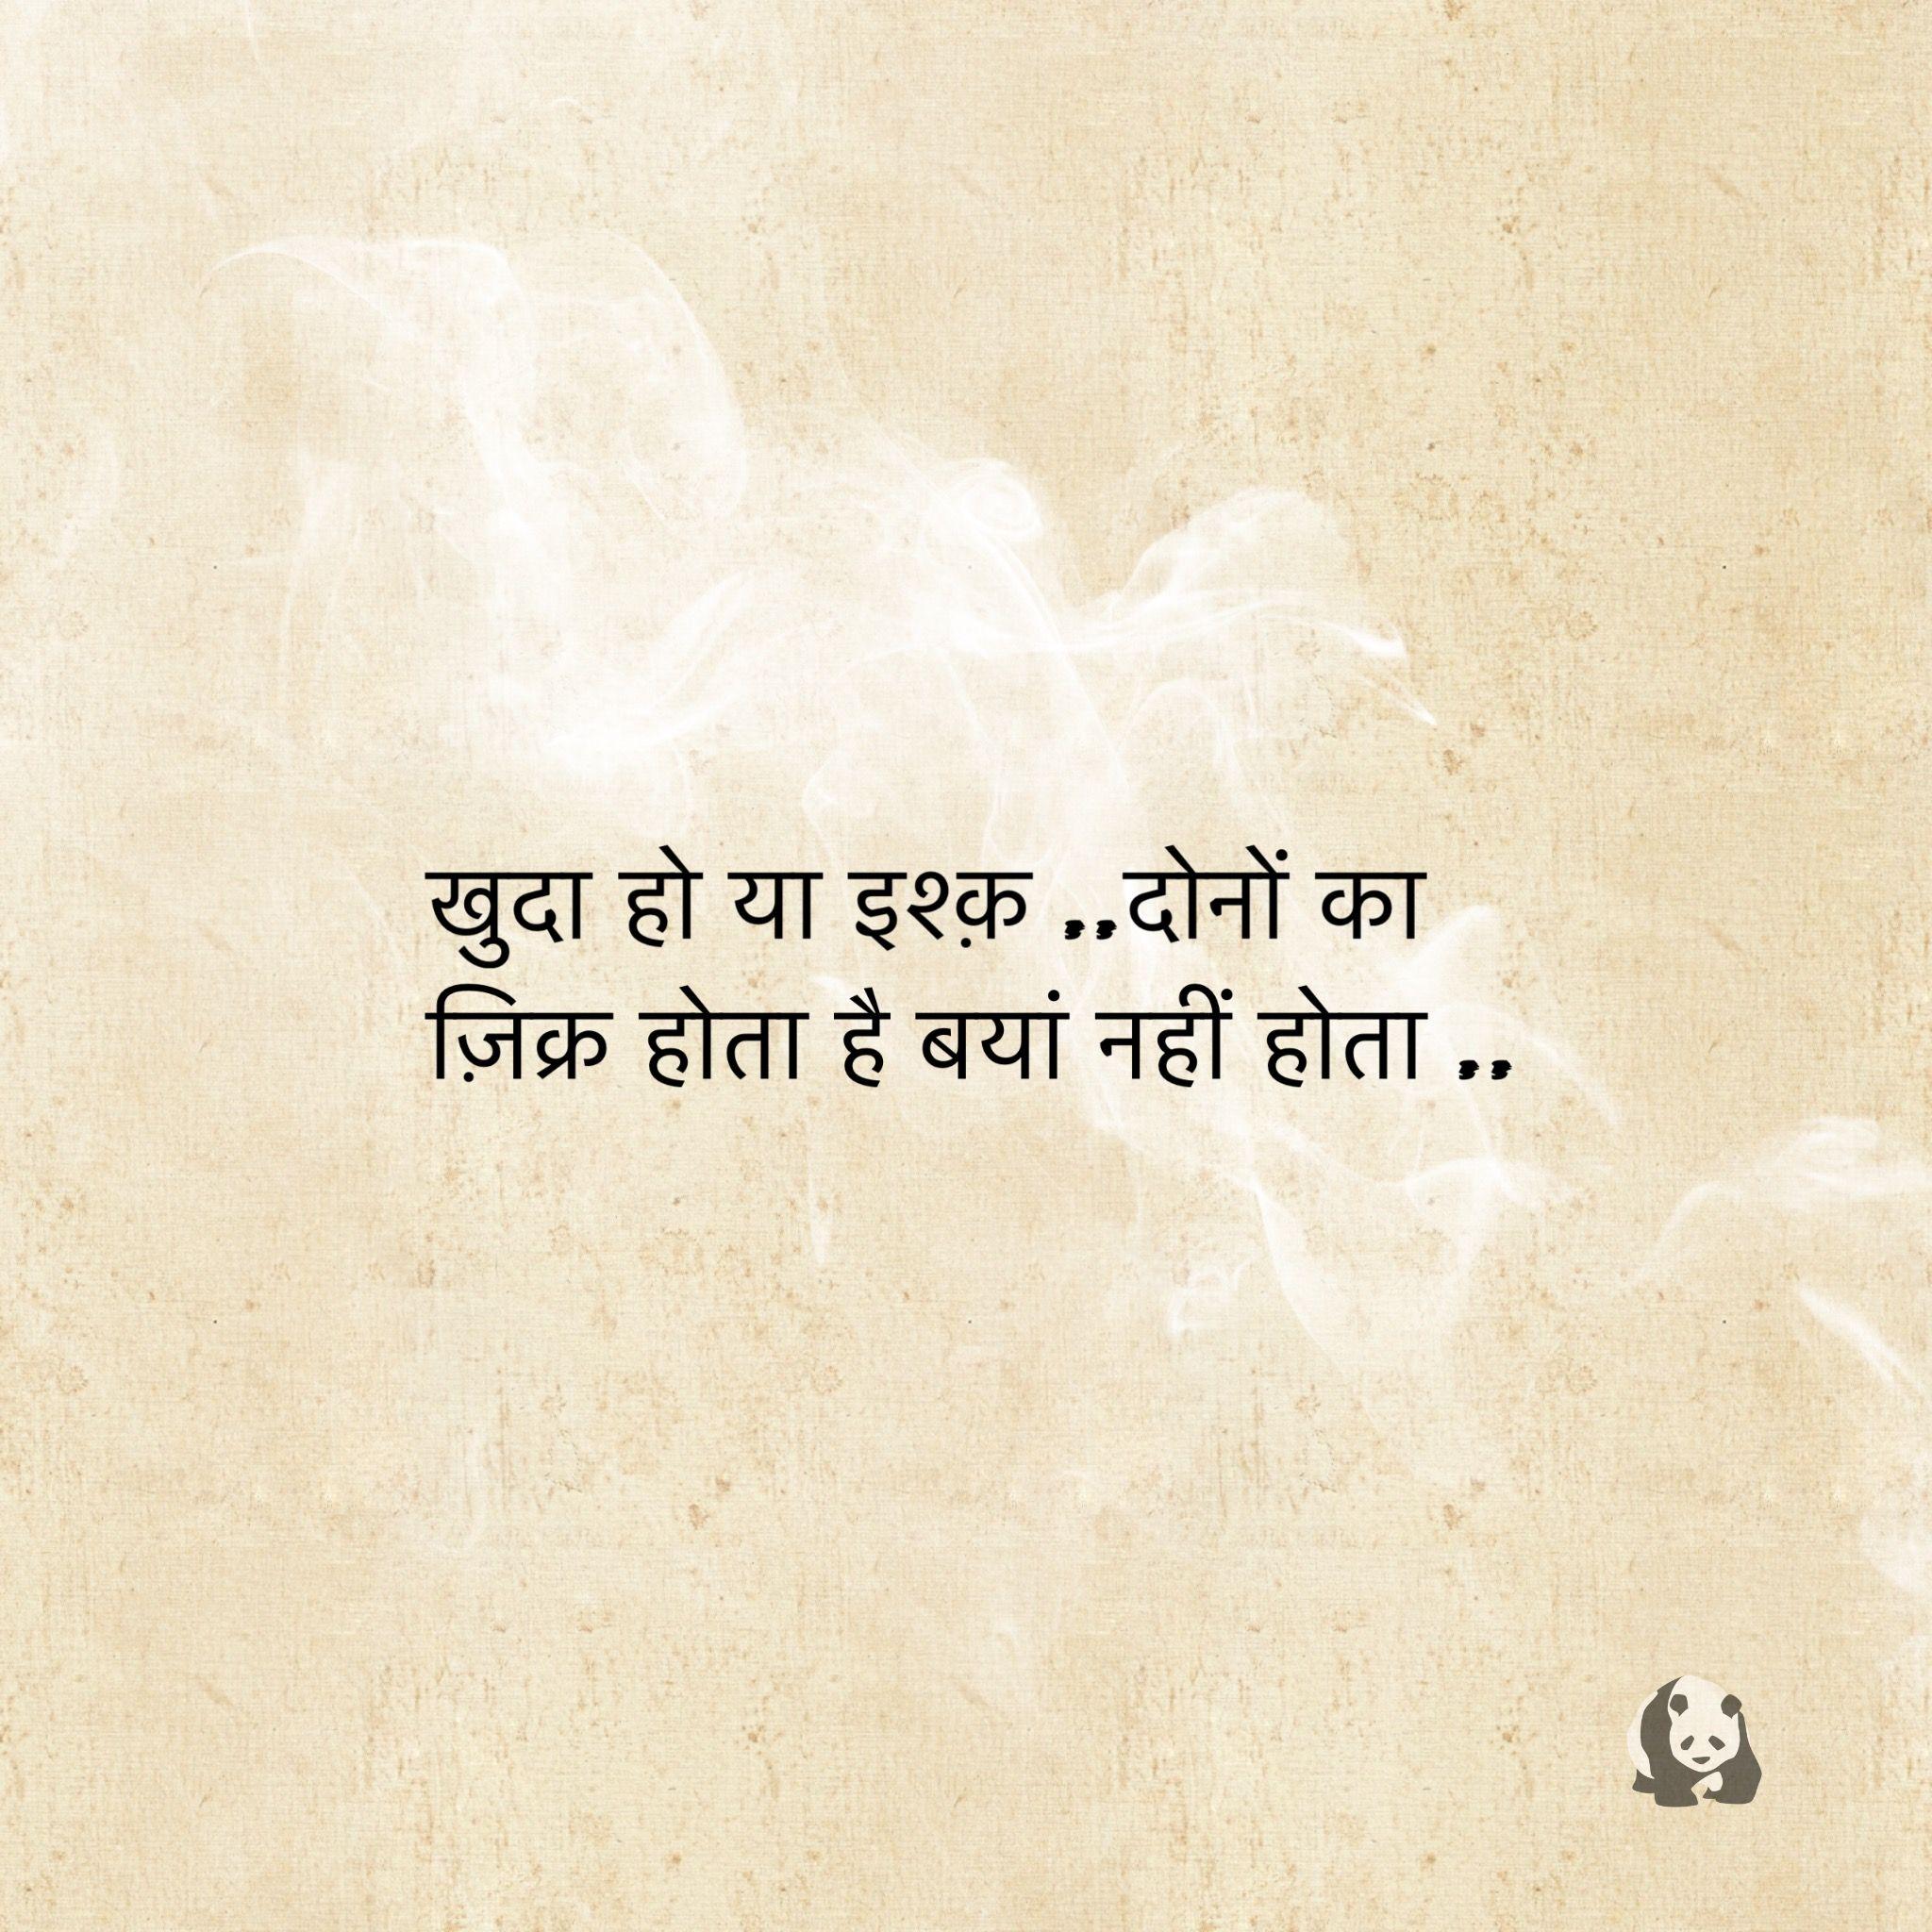 Pin By Sayali Kakad On Guftagu Feelings Quotes Gulzar Quotes Zindagi Quotes